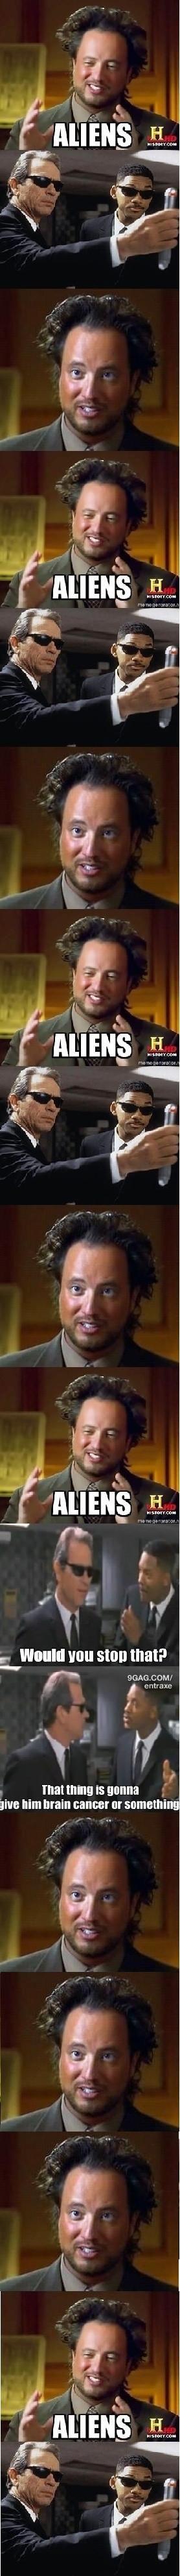 Aliens…  Enough said. Men In Black Mind Eraser on crazy Alien guy from History Channel. Funny Meme